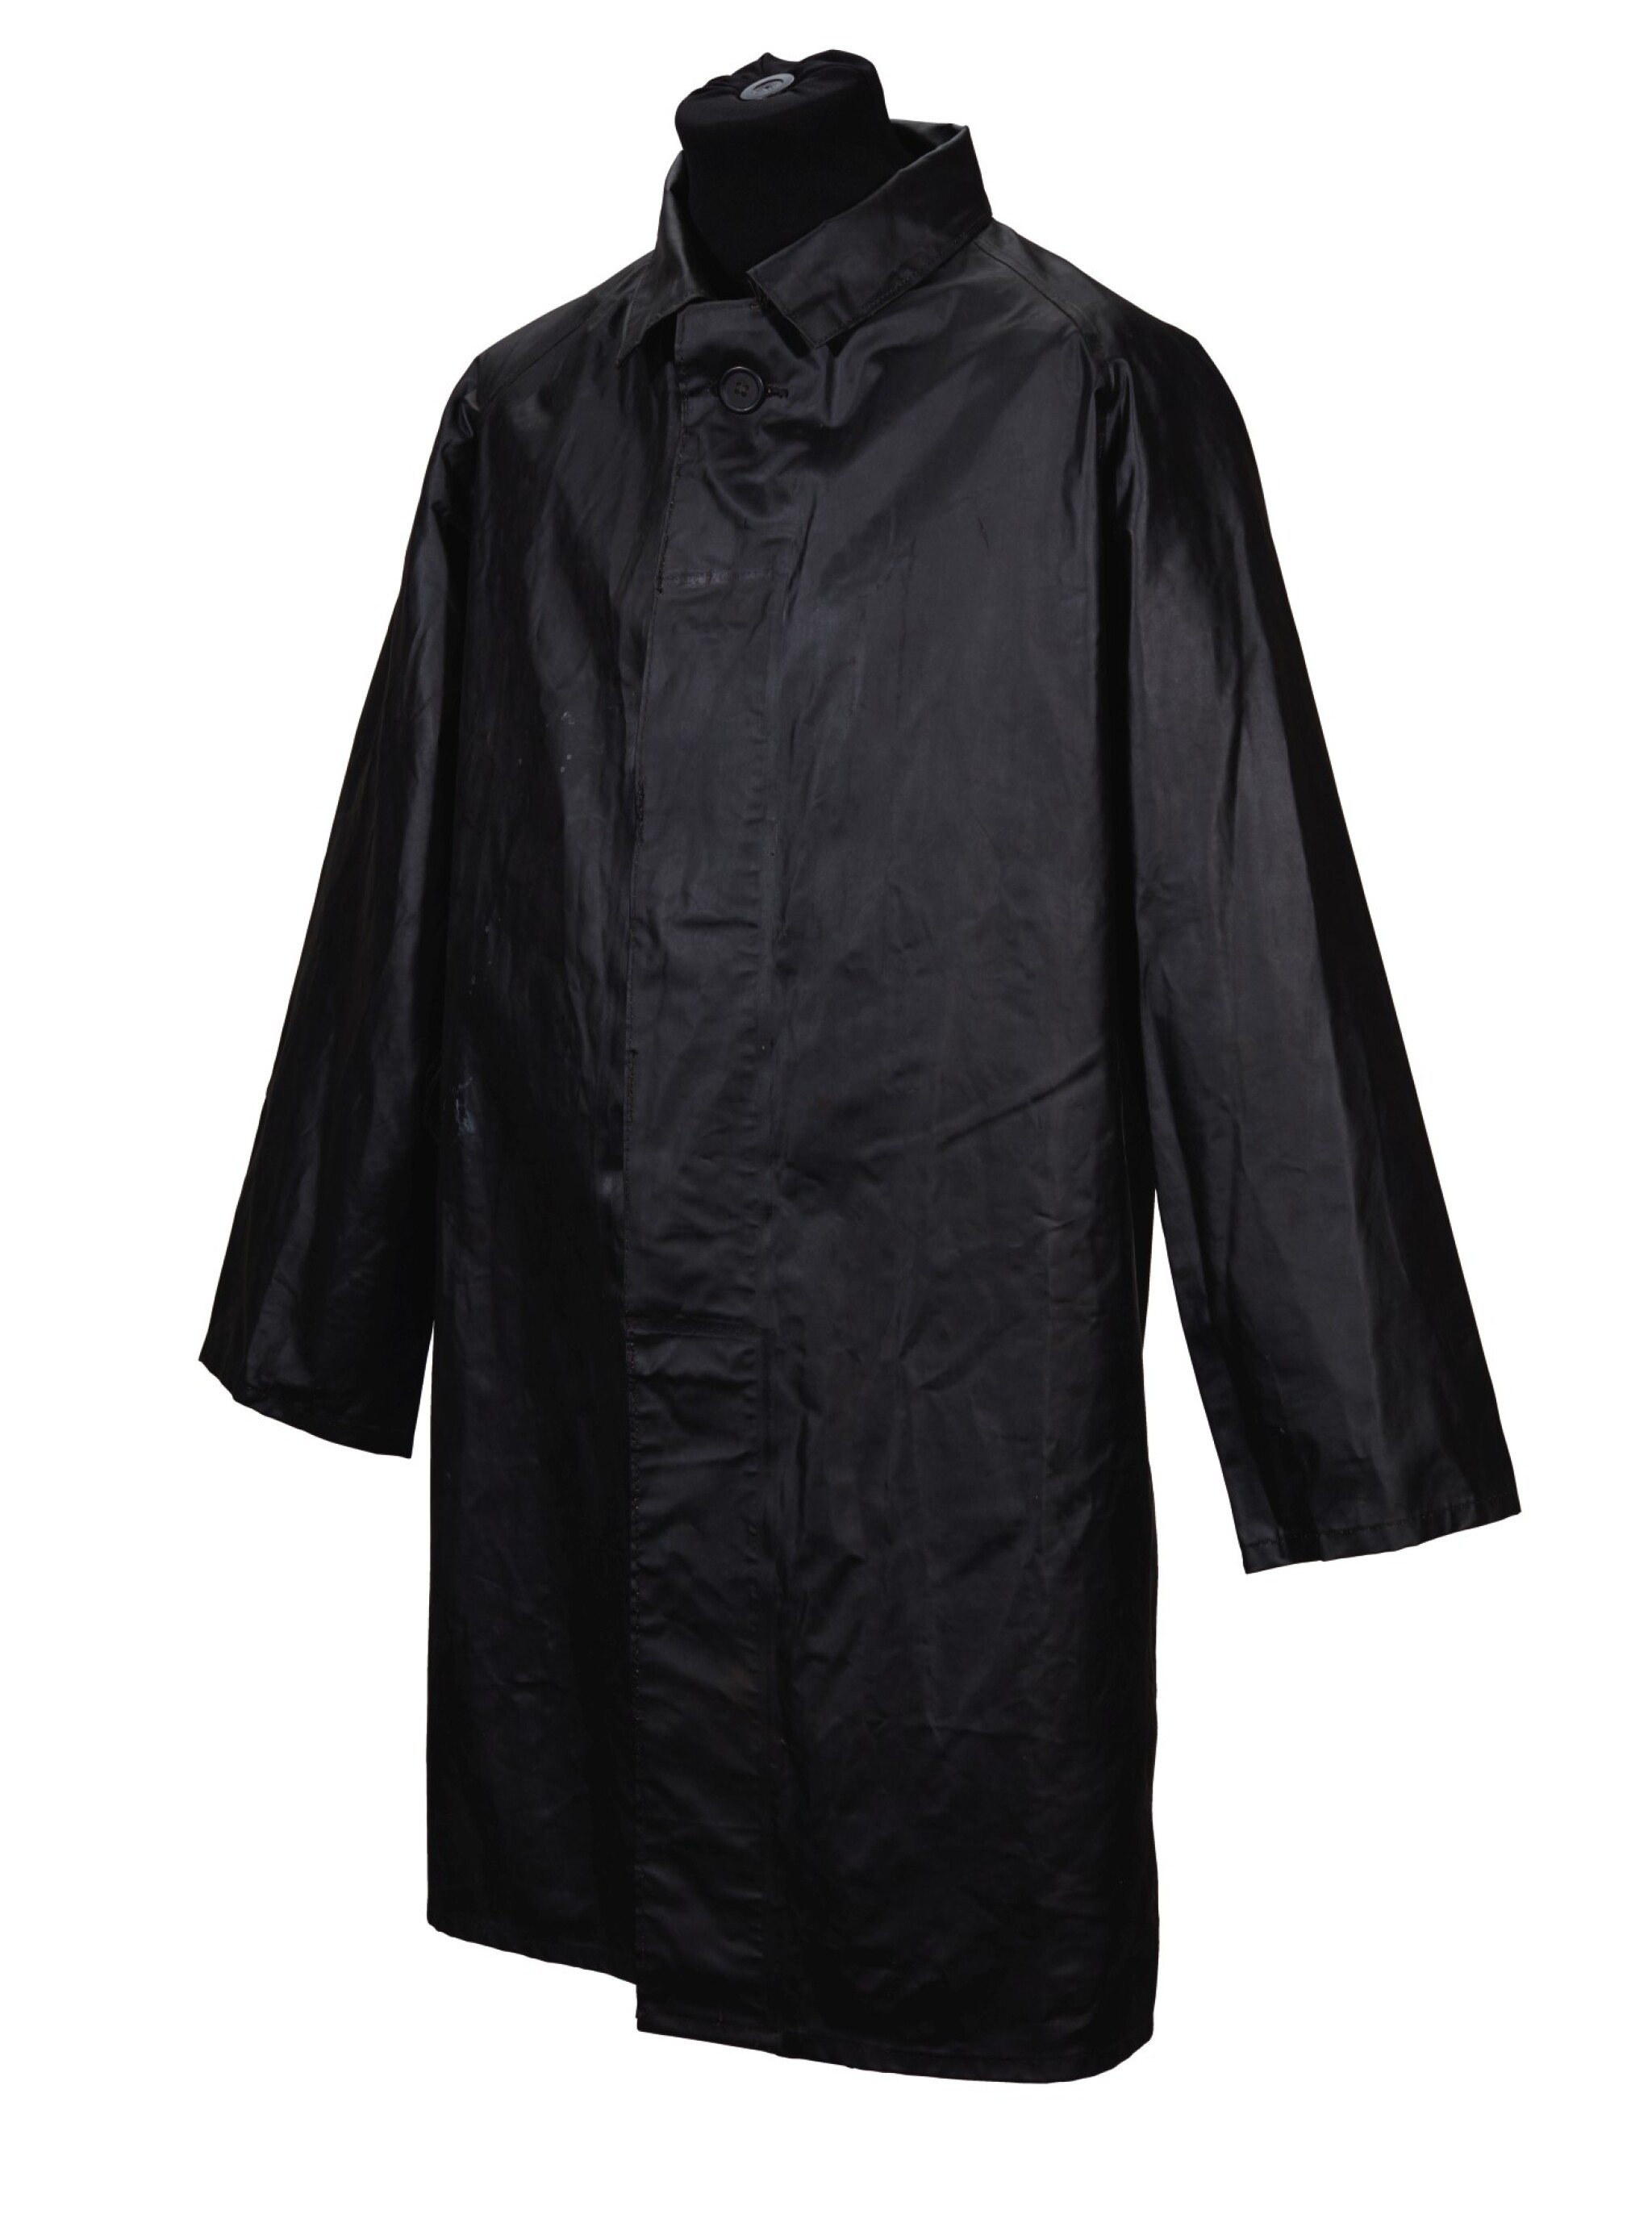 GEORGE HARRISON   Black JelTek raincoat, three-quarter length